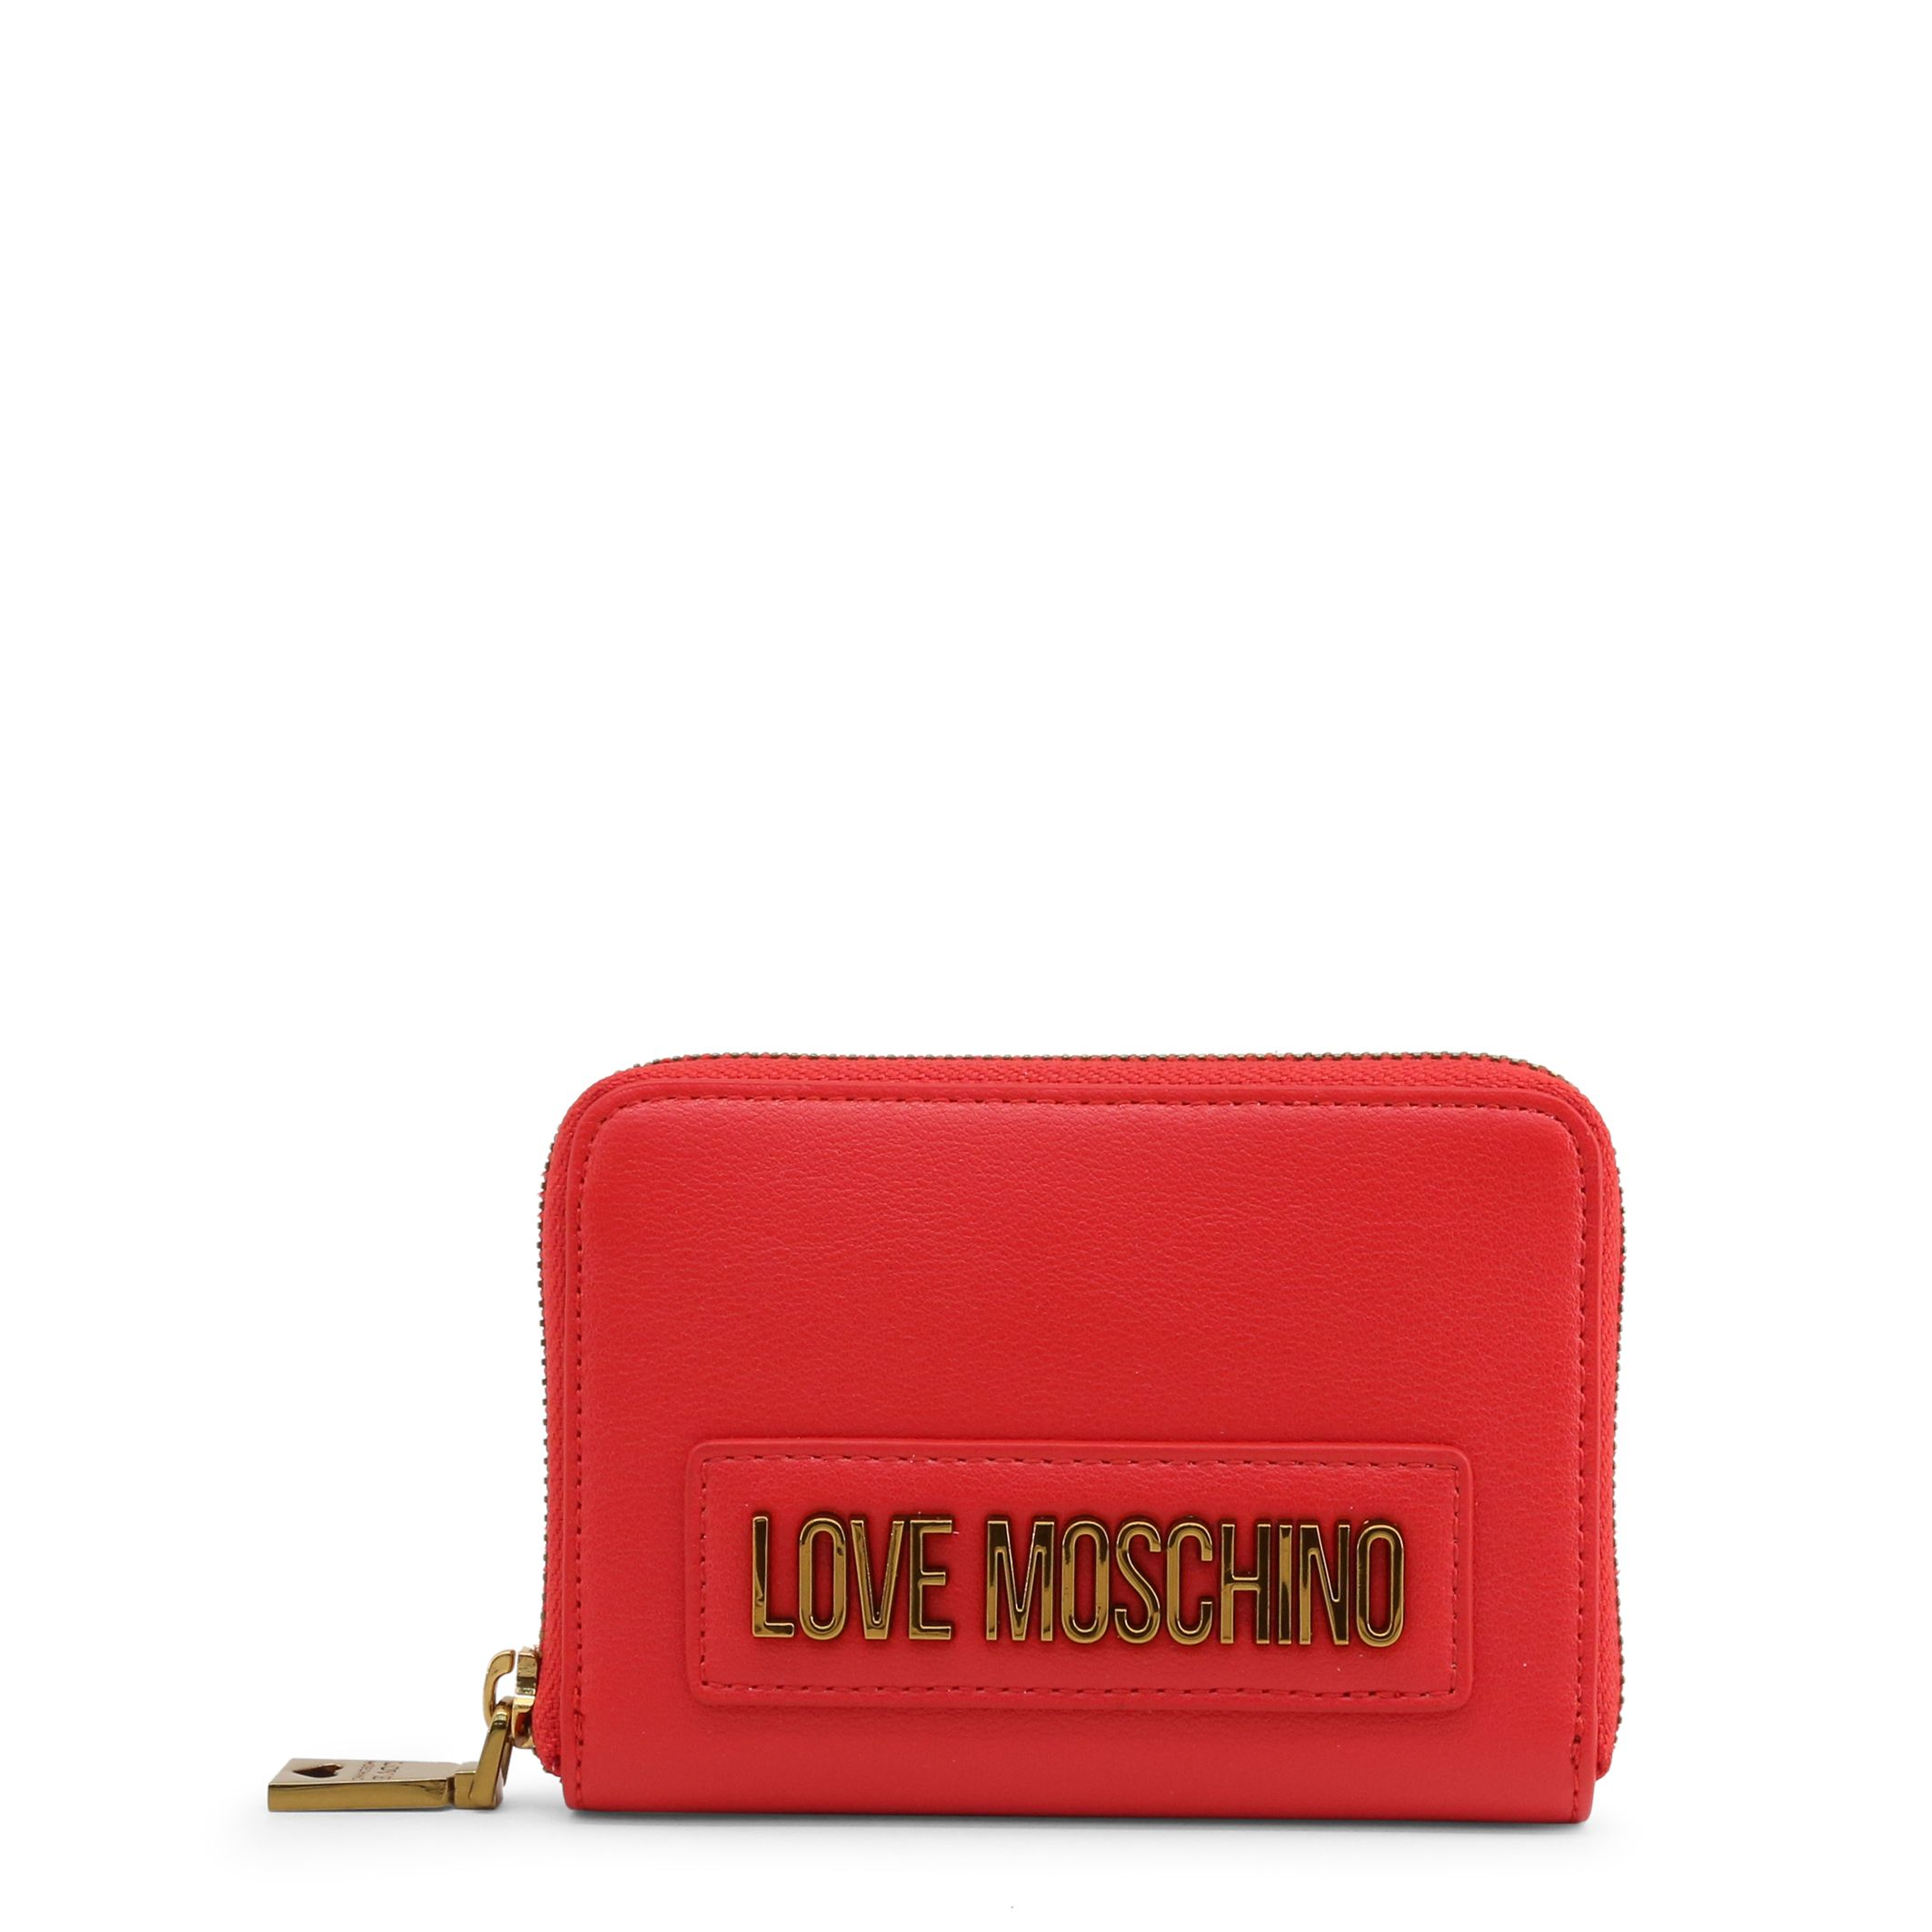 Love Moschino - JC5624PP1BLK - Red - Women